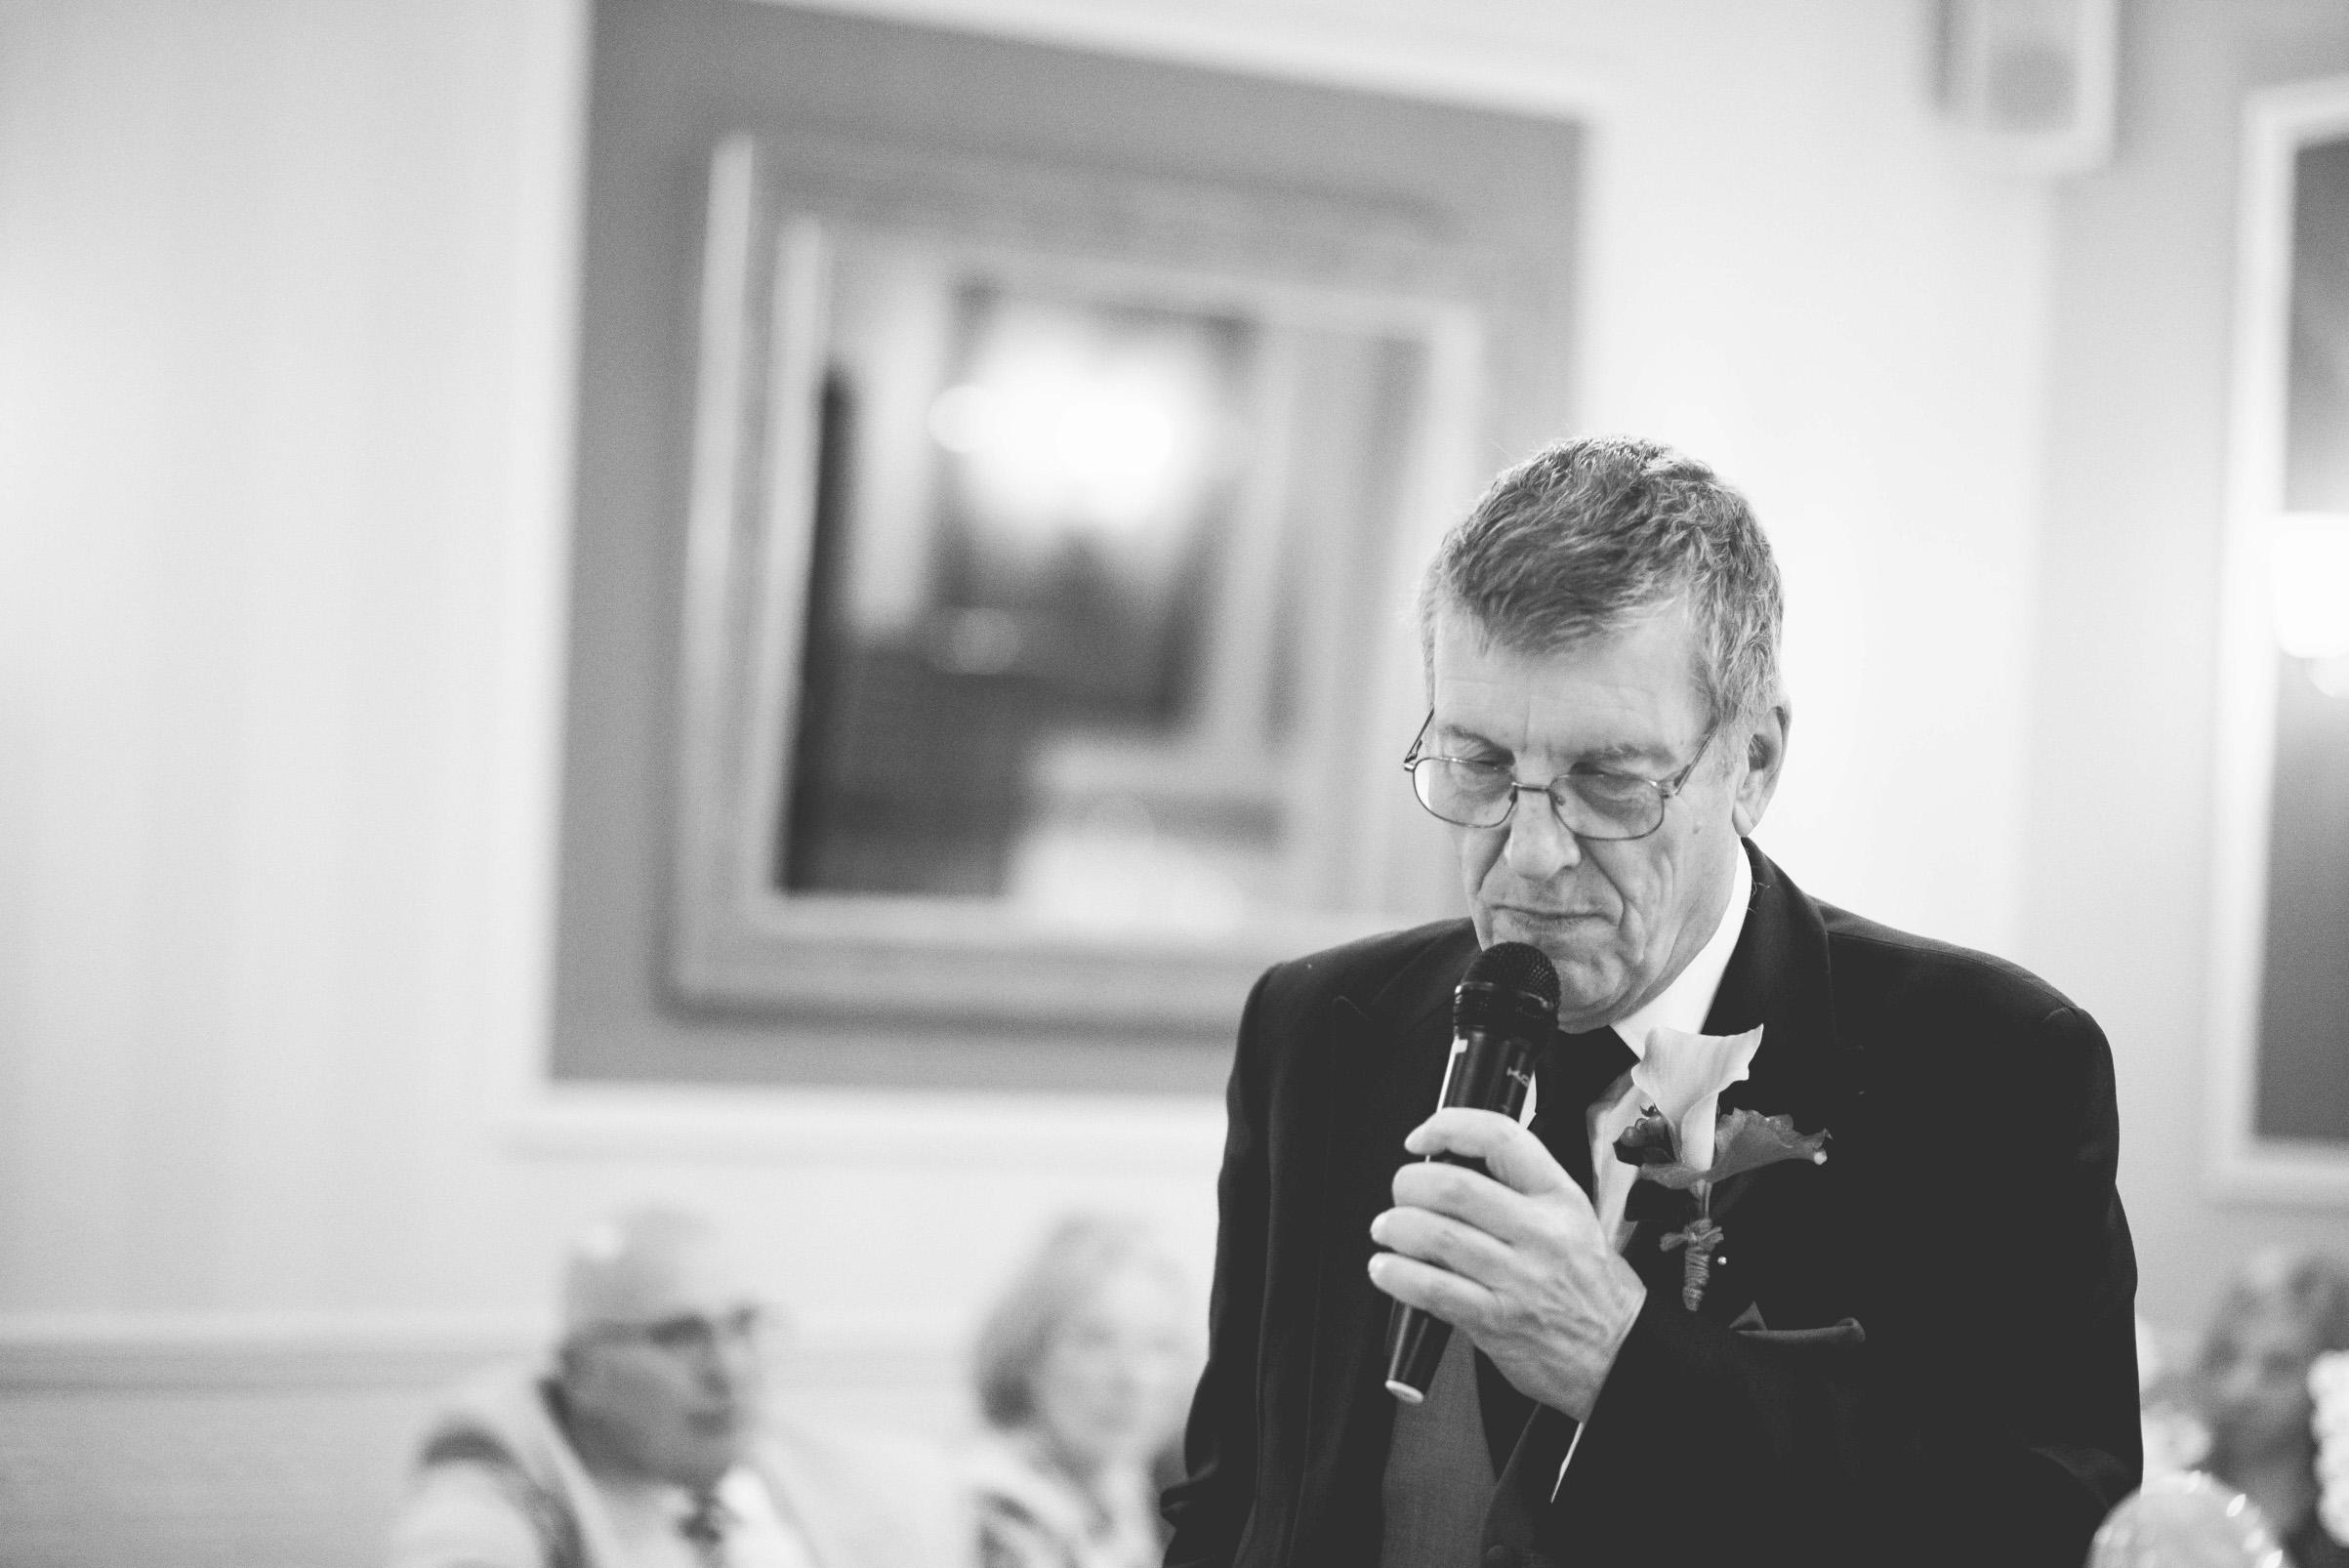 The+Fairlawns+wedding+Aldridge+StLukes+Church-200.jpg